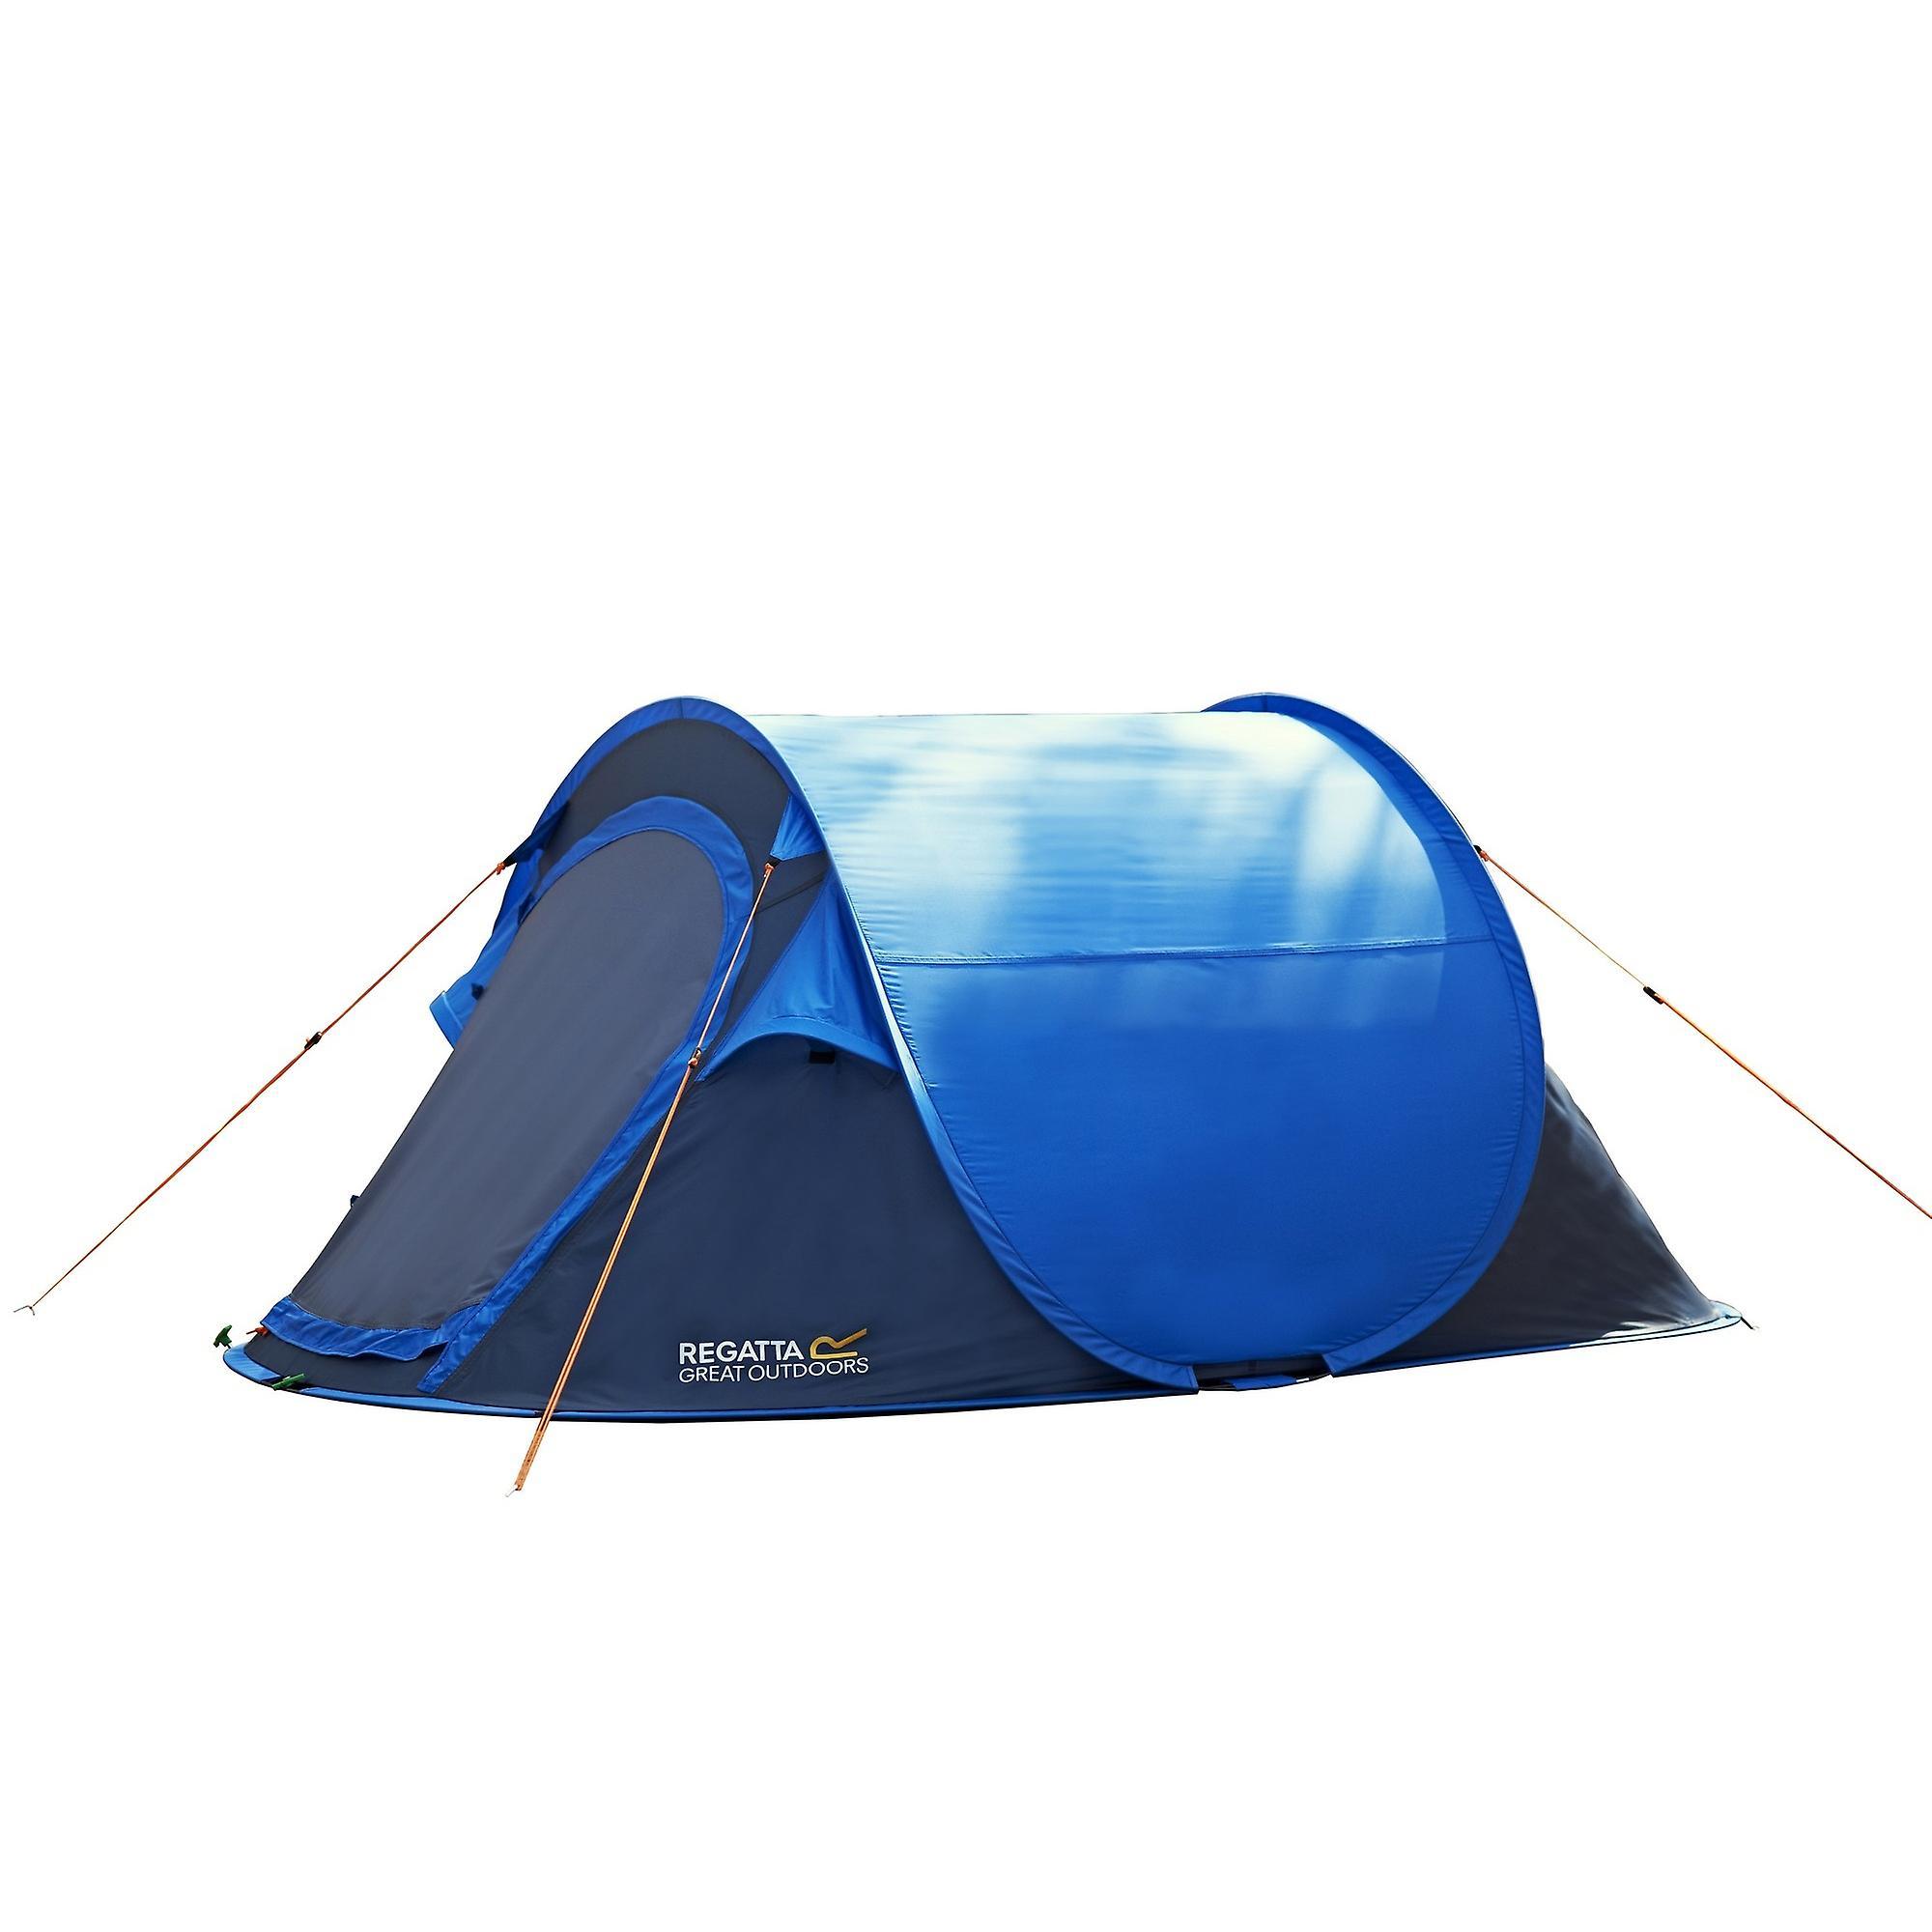 Regatta Great Outdoors Malawi 2 Man Pop Up Tent